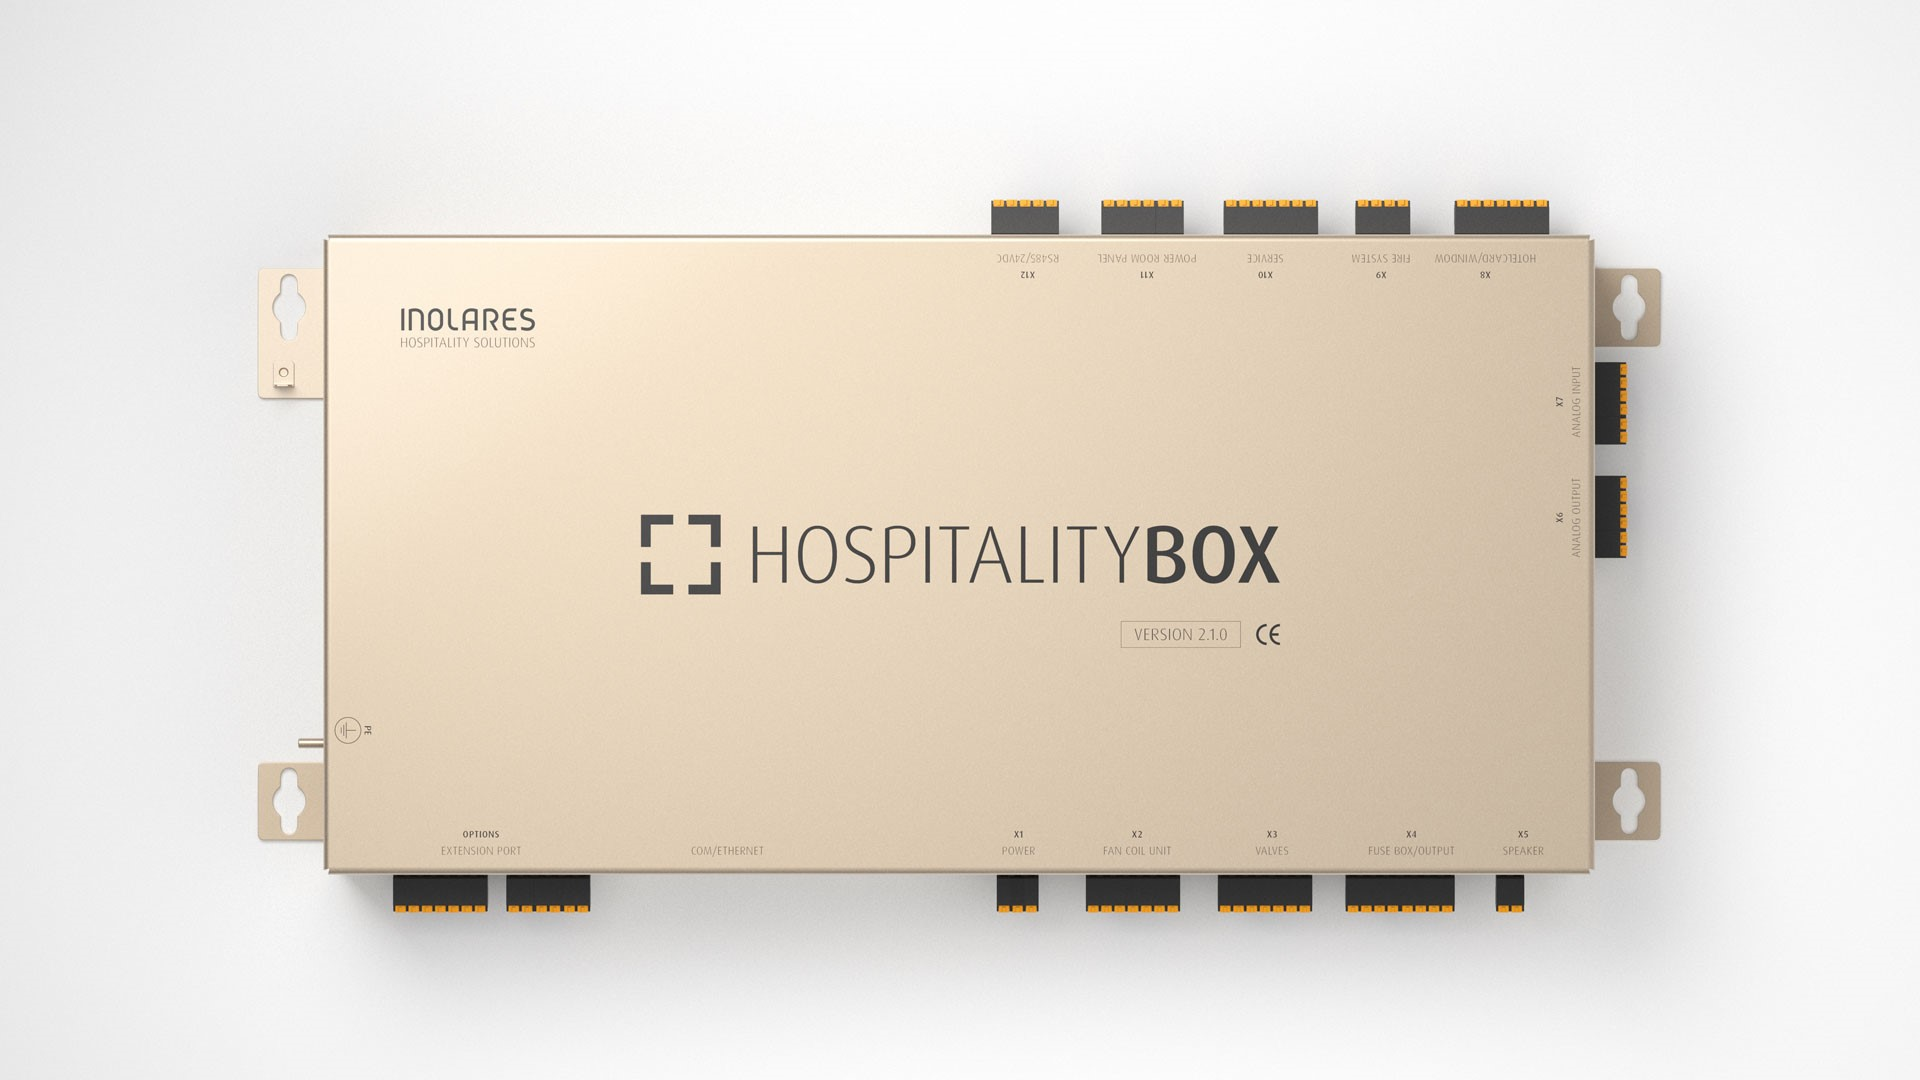 Abbildung der Hospitality Box